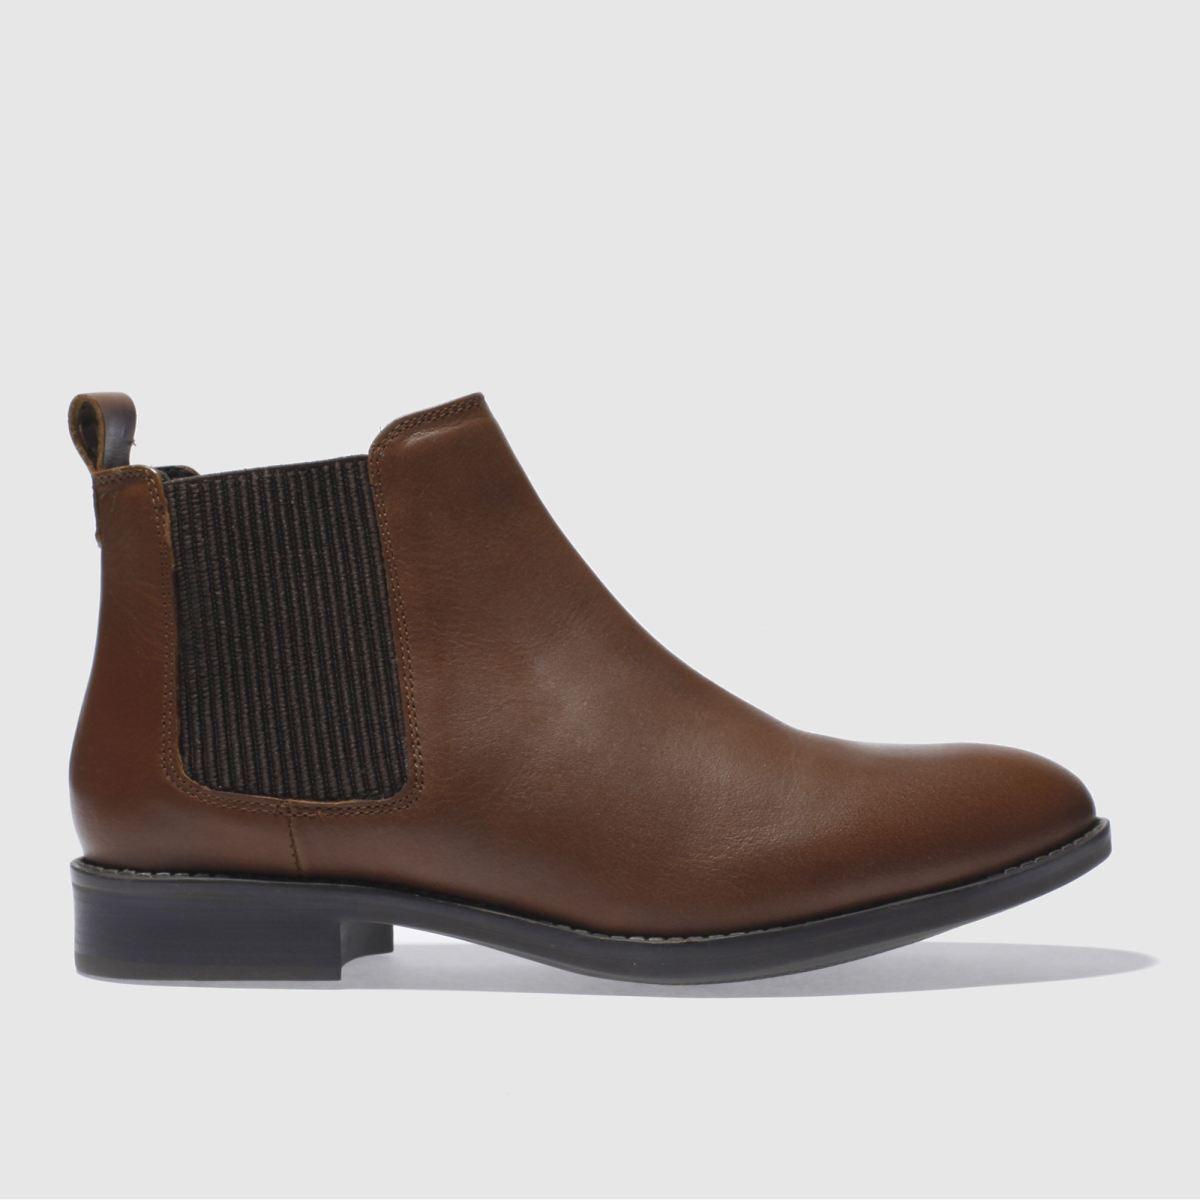 schuh Schuh Tan Pressure Boots